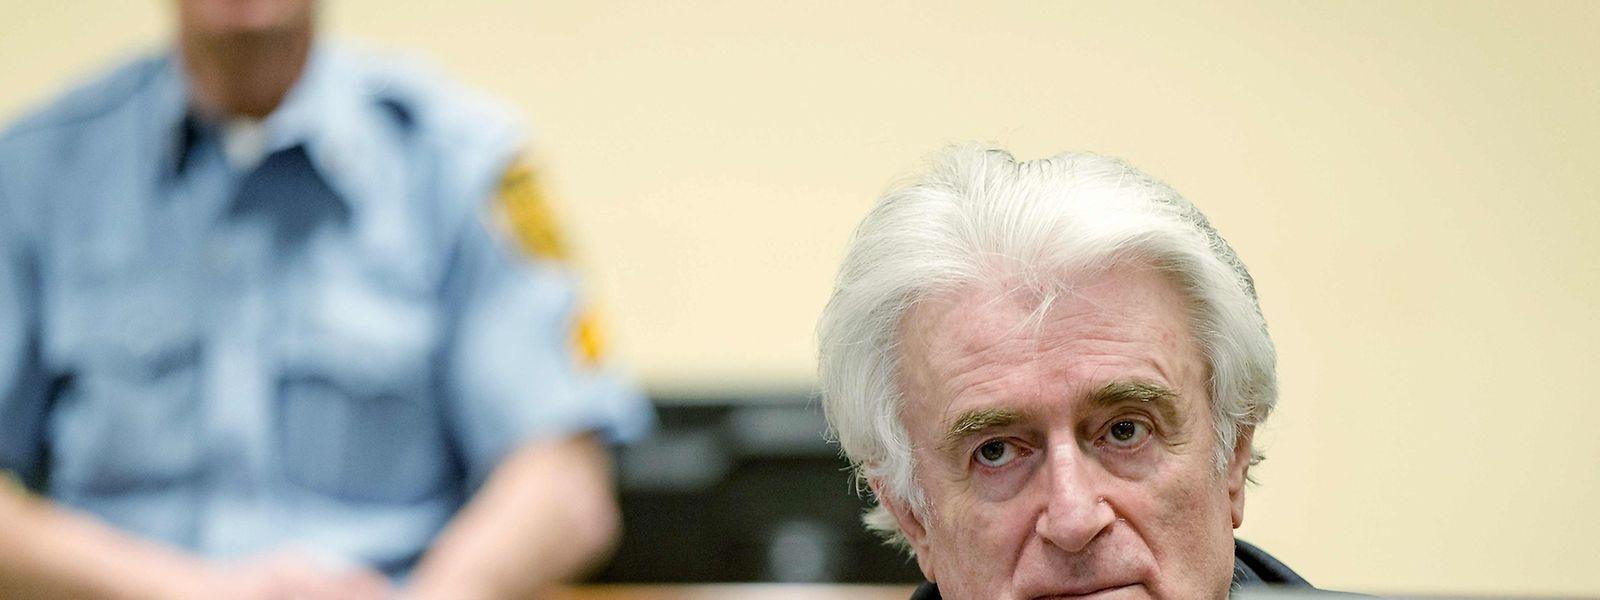 Karadzic während der Urteilsverkündung.